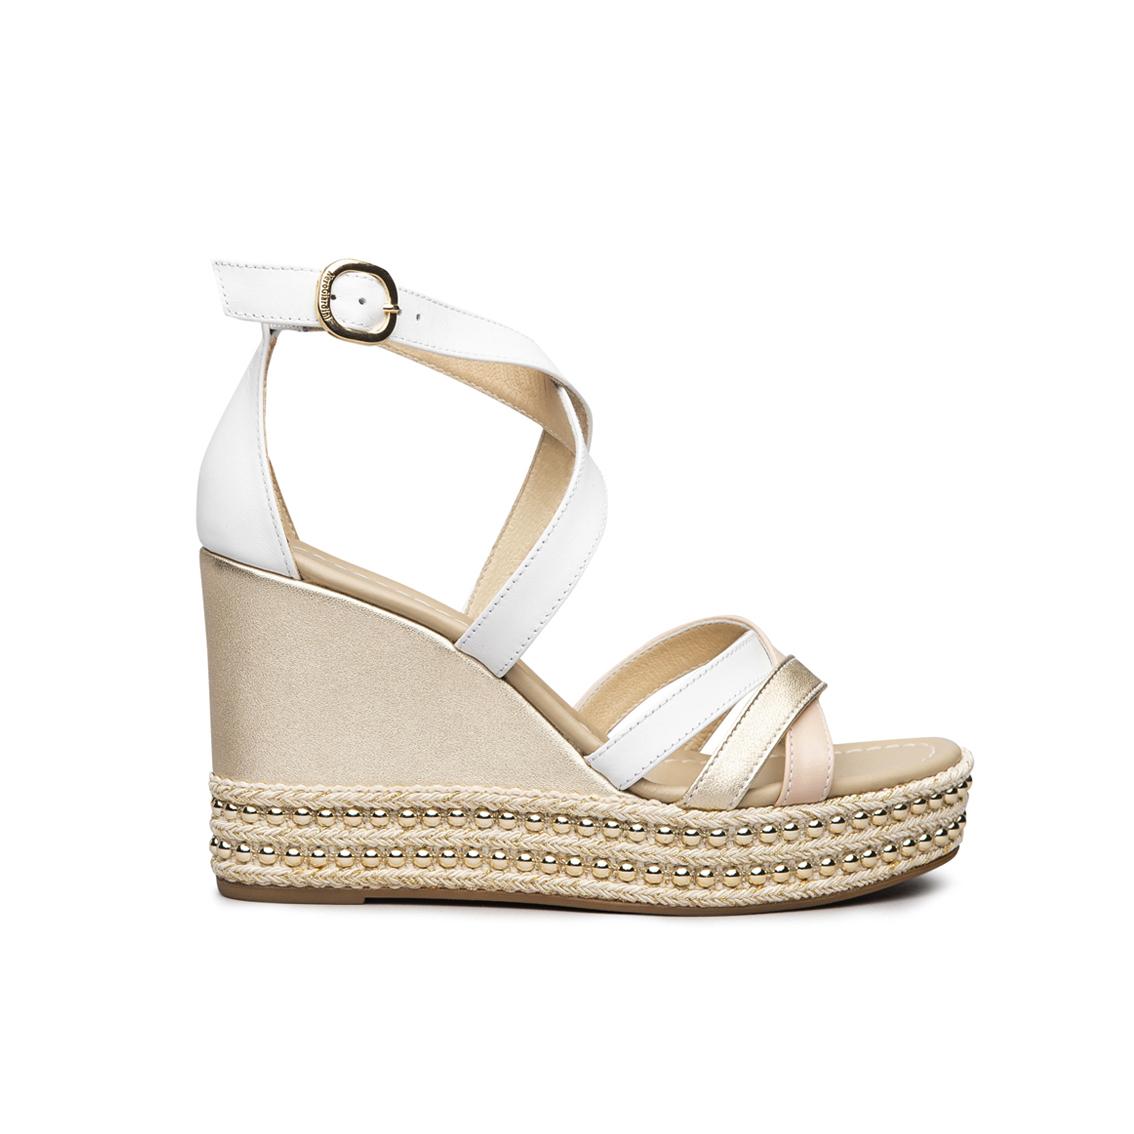 Sandalo bianco con zeppa NeroGiardini